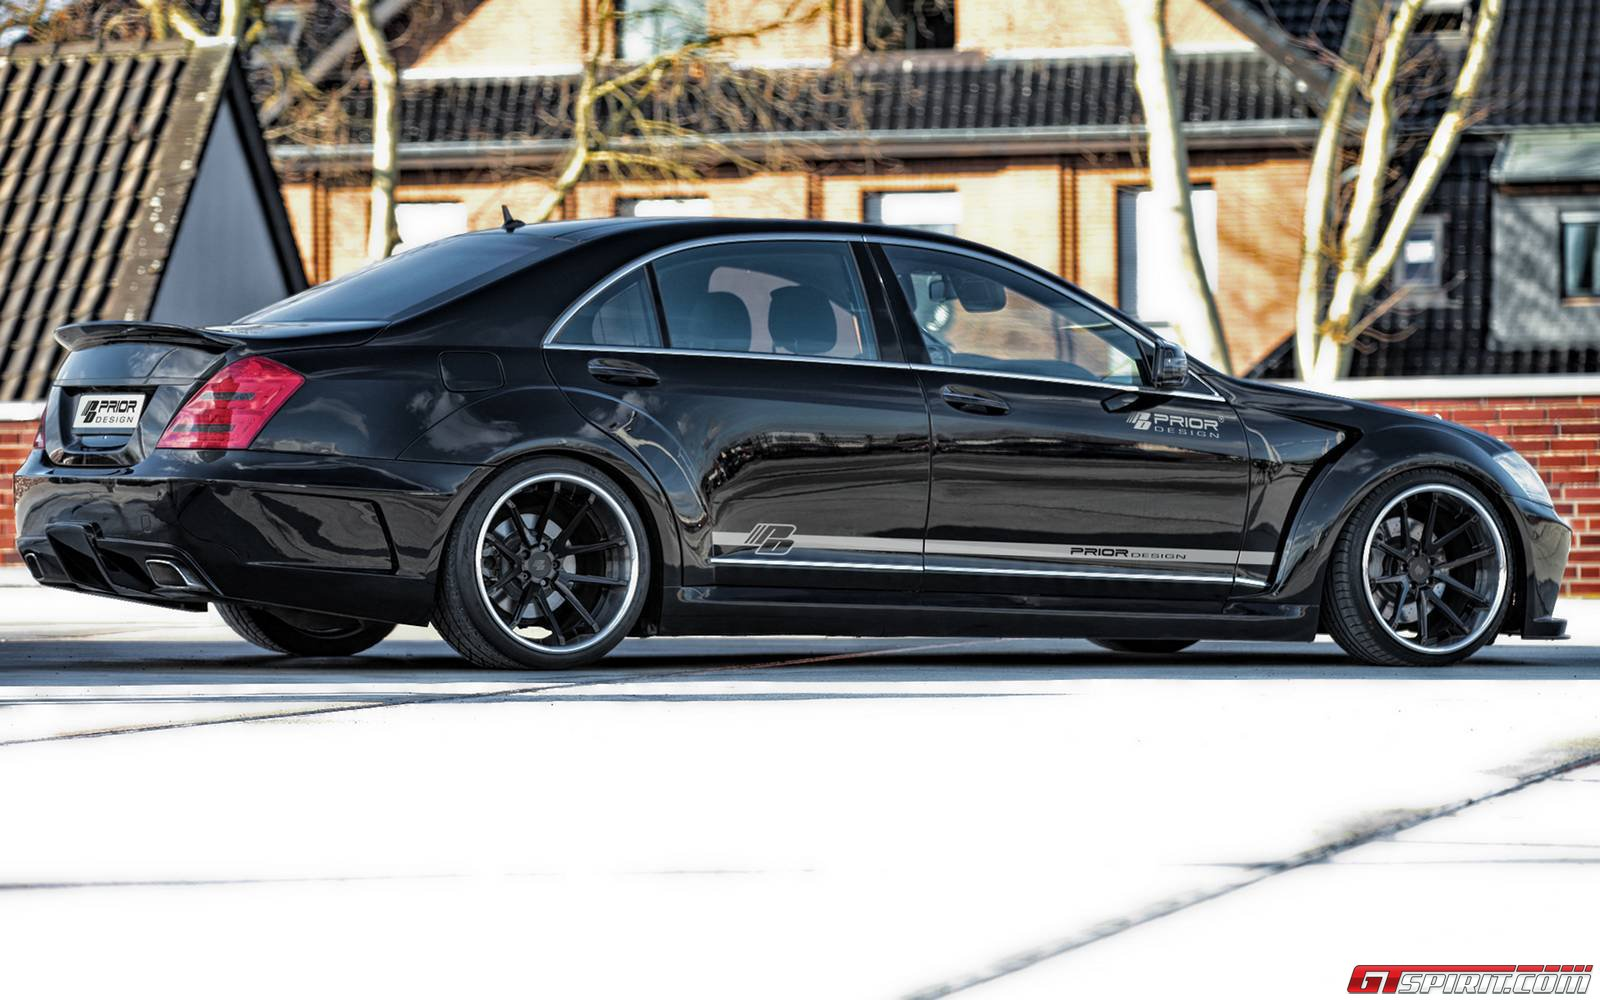 official mercedes benz s class v2 widebody black edition by prior design gtspirit - Mercedes Benz 2014 S Class Black